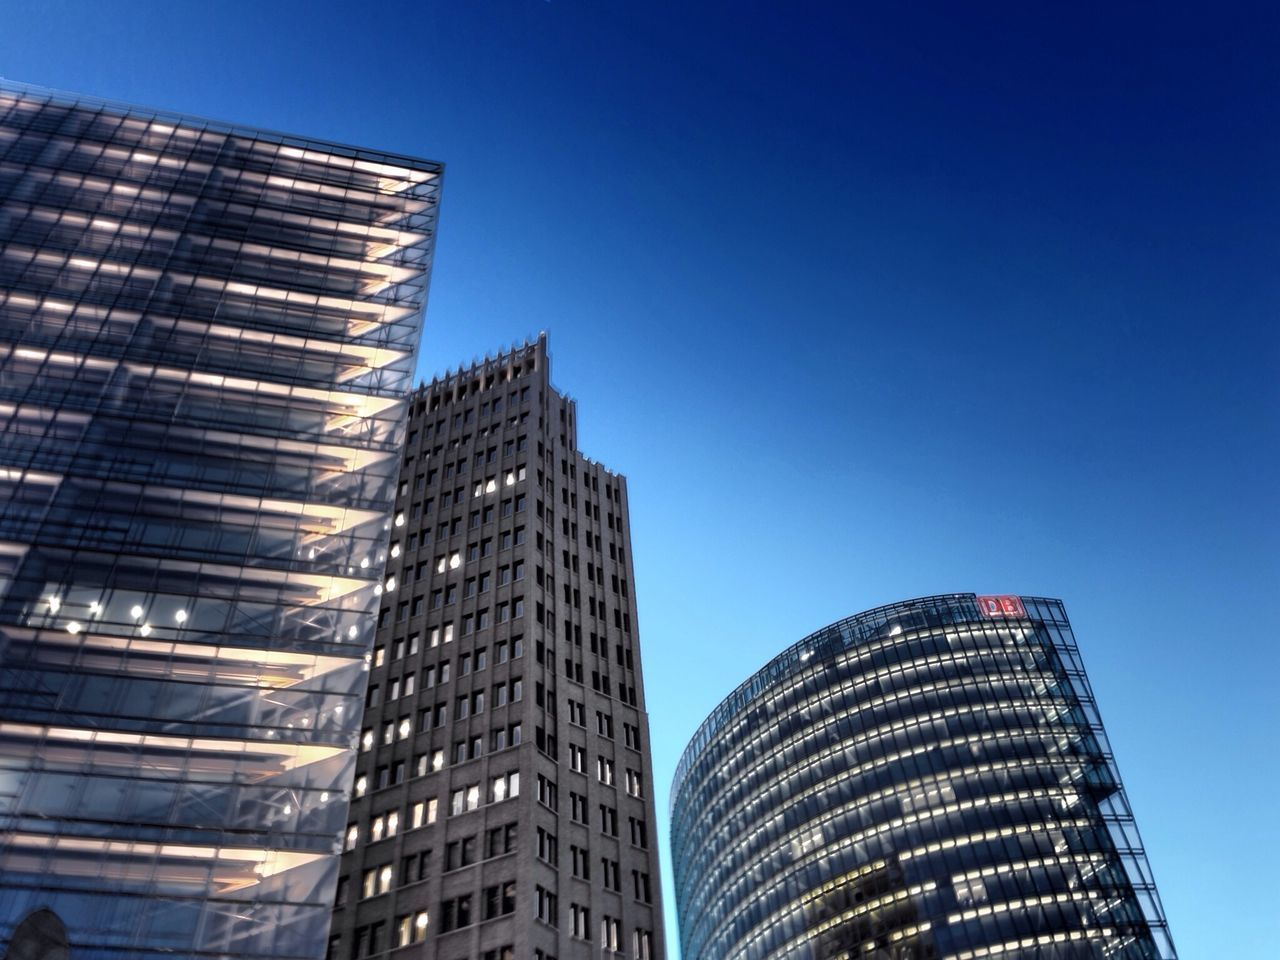 Sky Skyscrapers Architecture